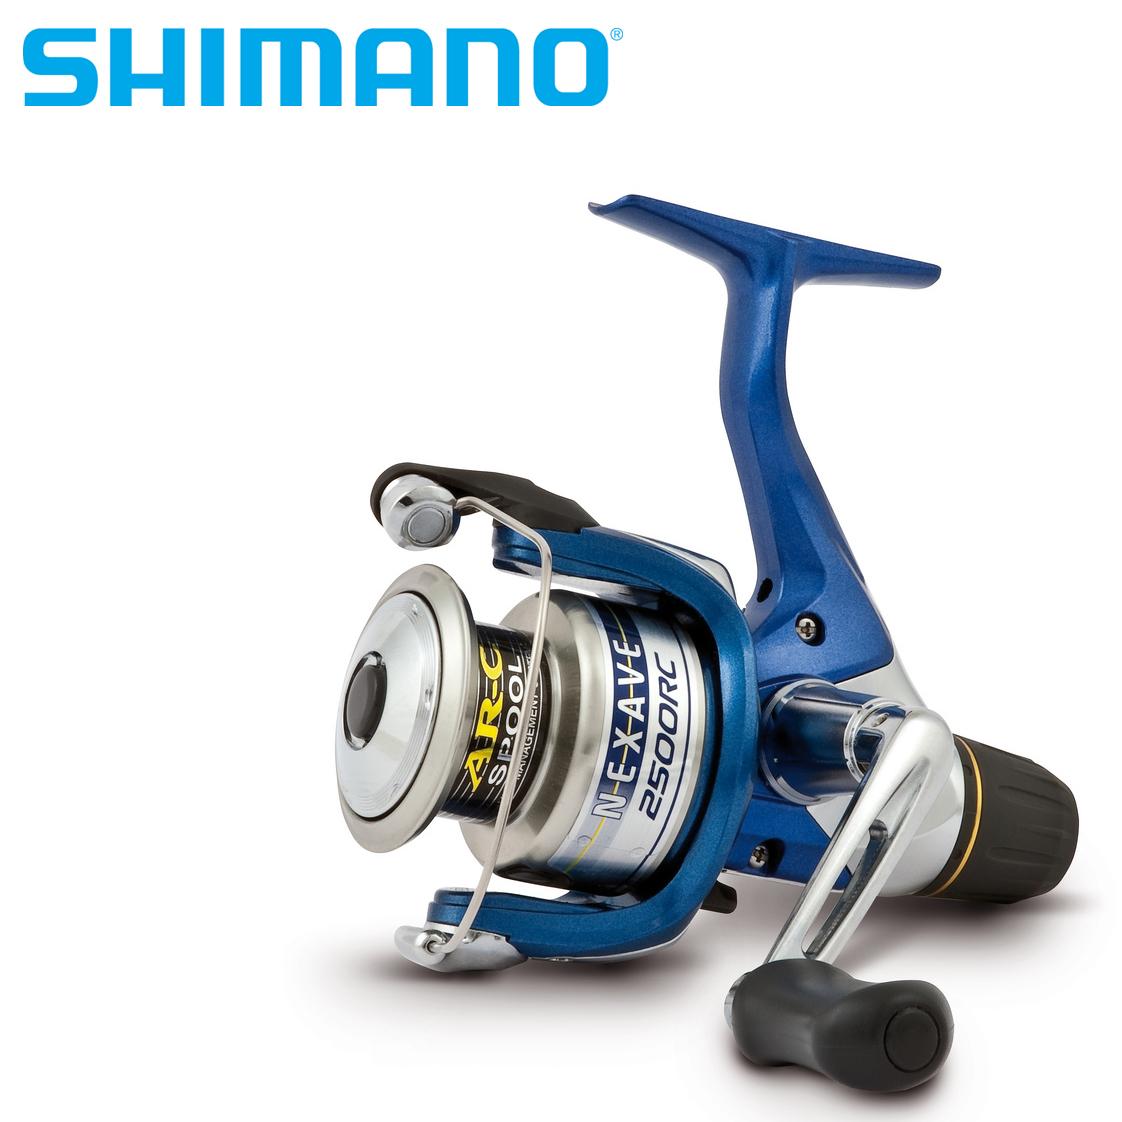 Катушка безынерционная SHIMANO NEXAVE 4000 RC